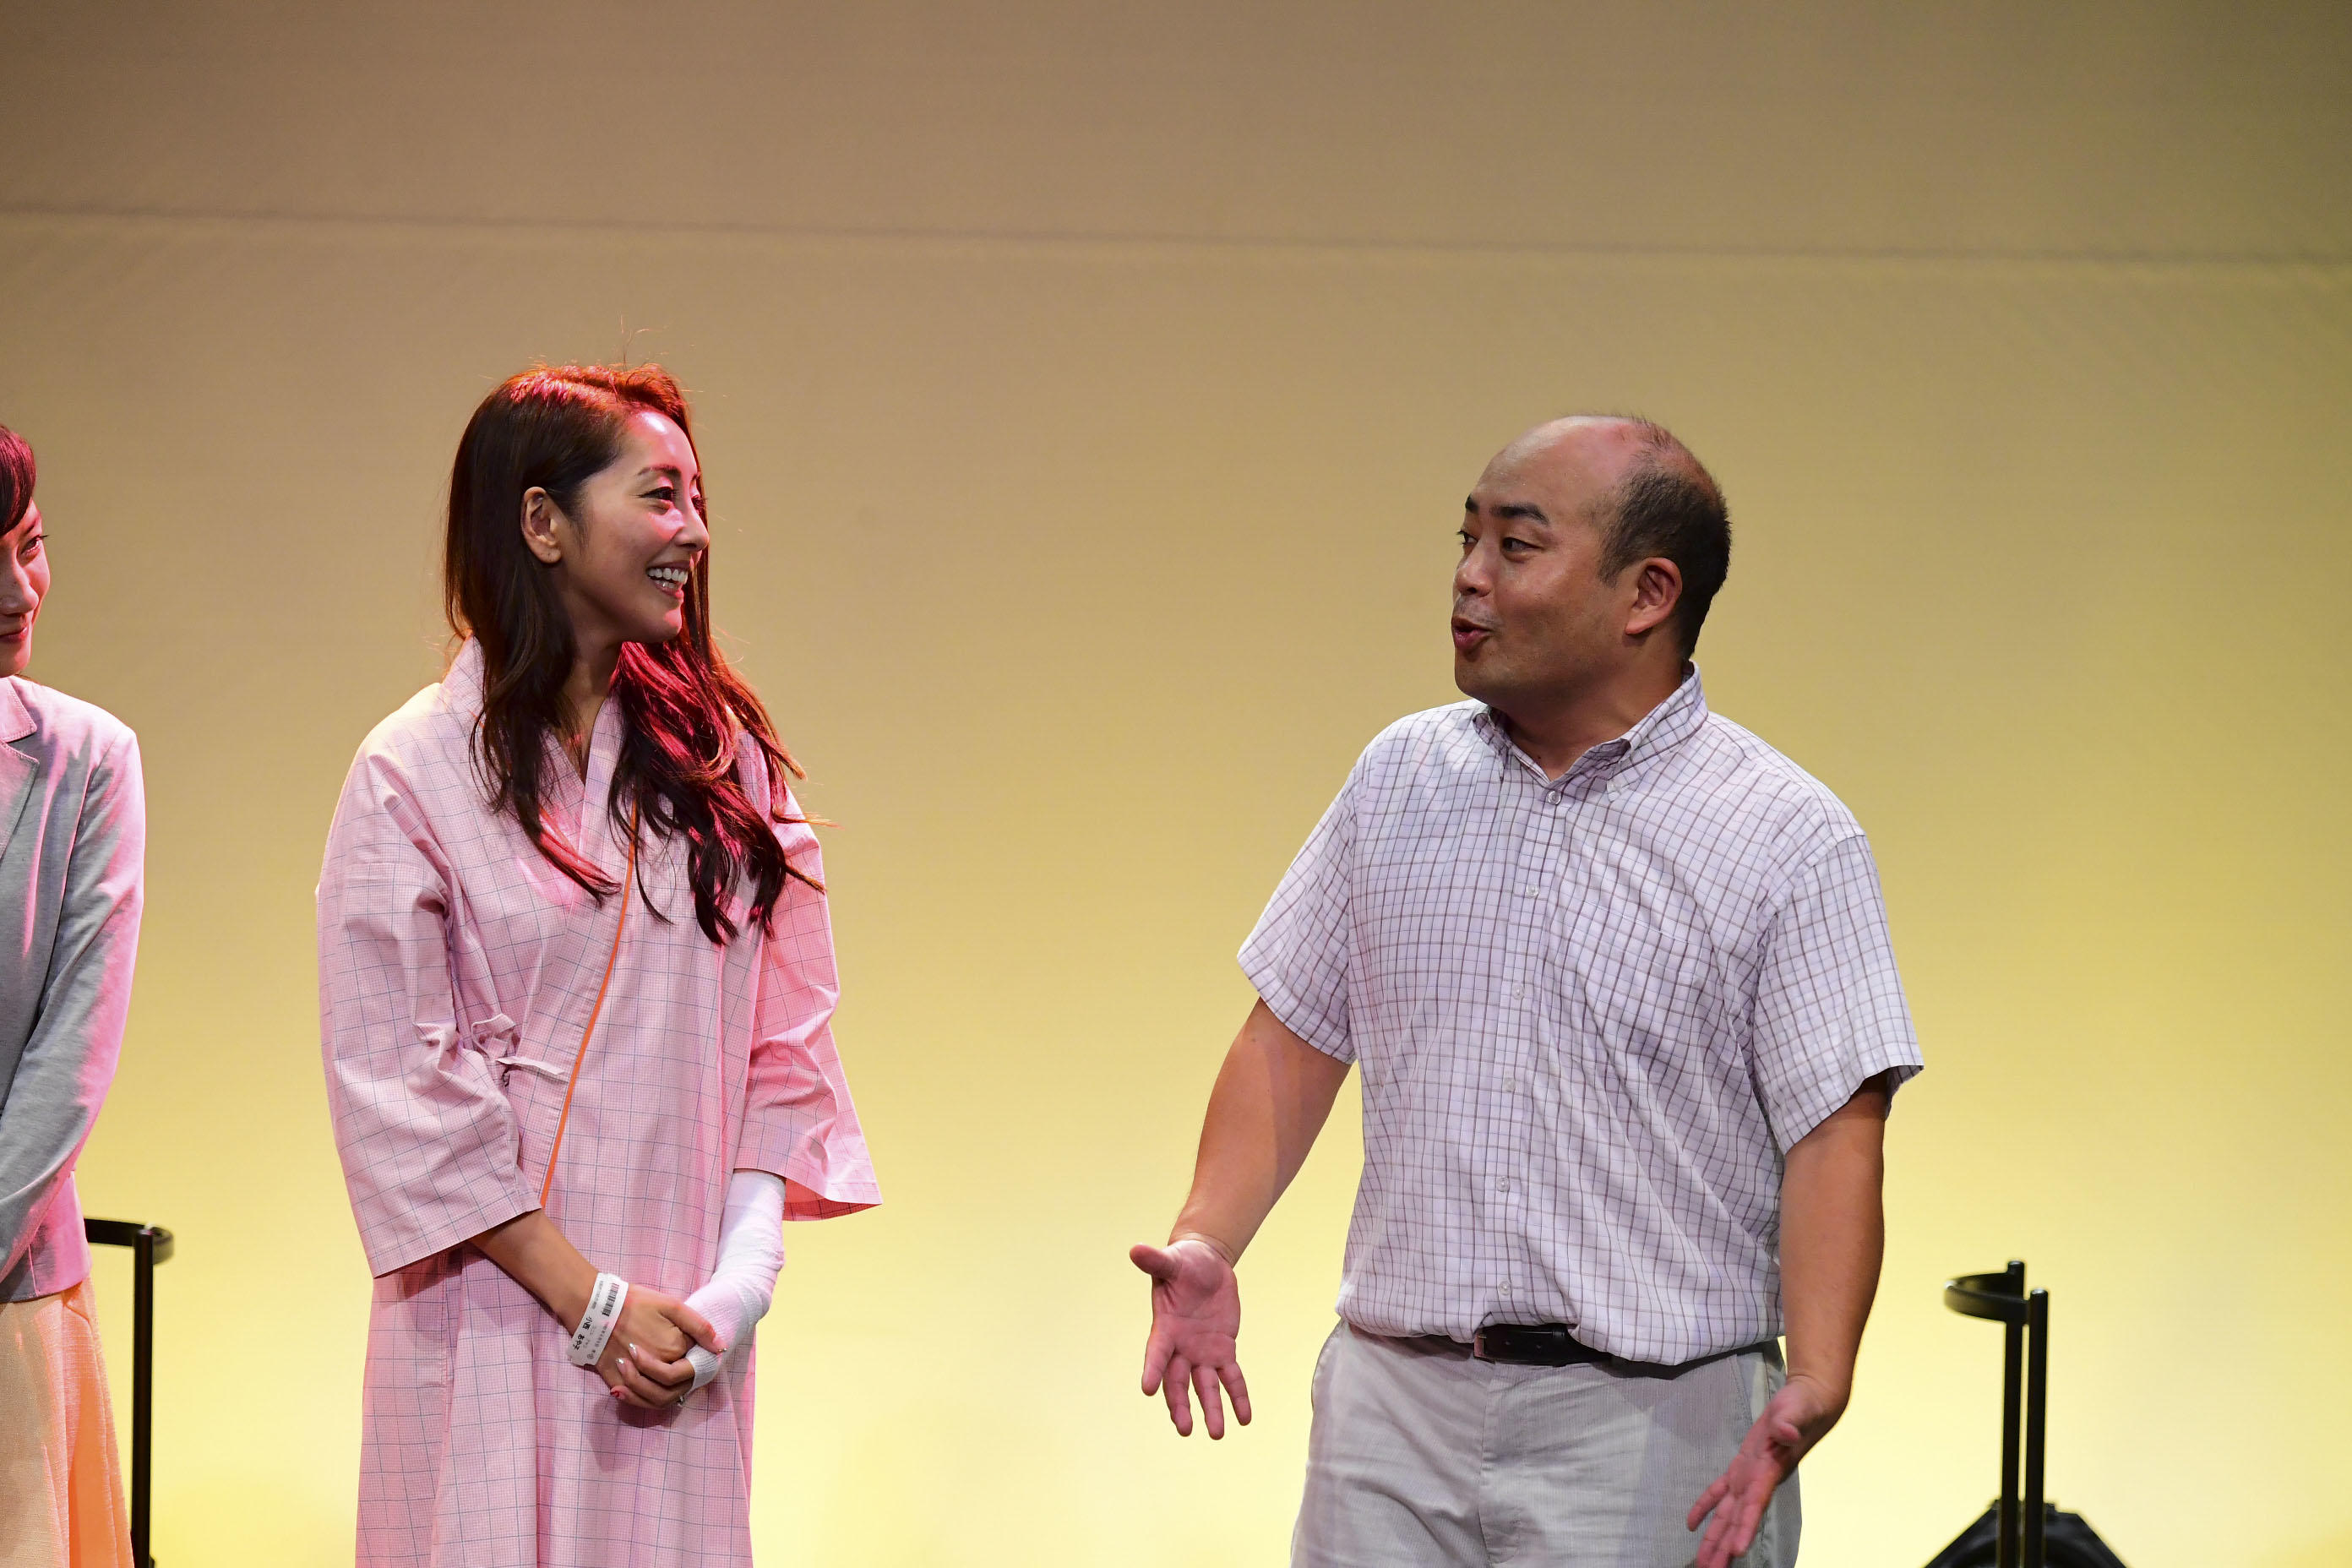 http://news.yoshimoto.co.jp/20170805013444-835838e4003e089fa5457fa7569062fa08b418a2.jpg